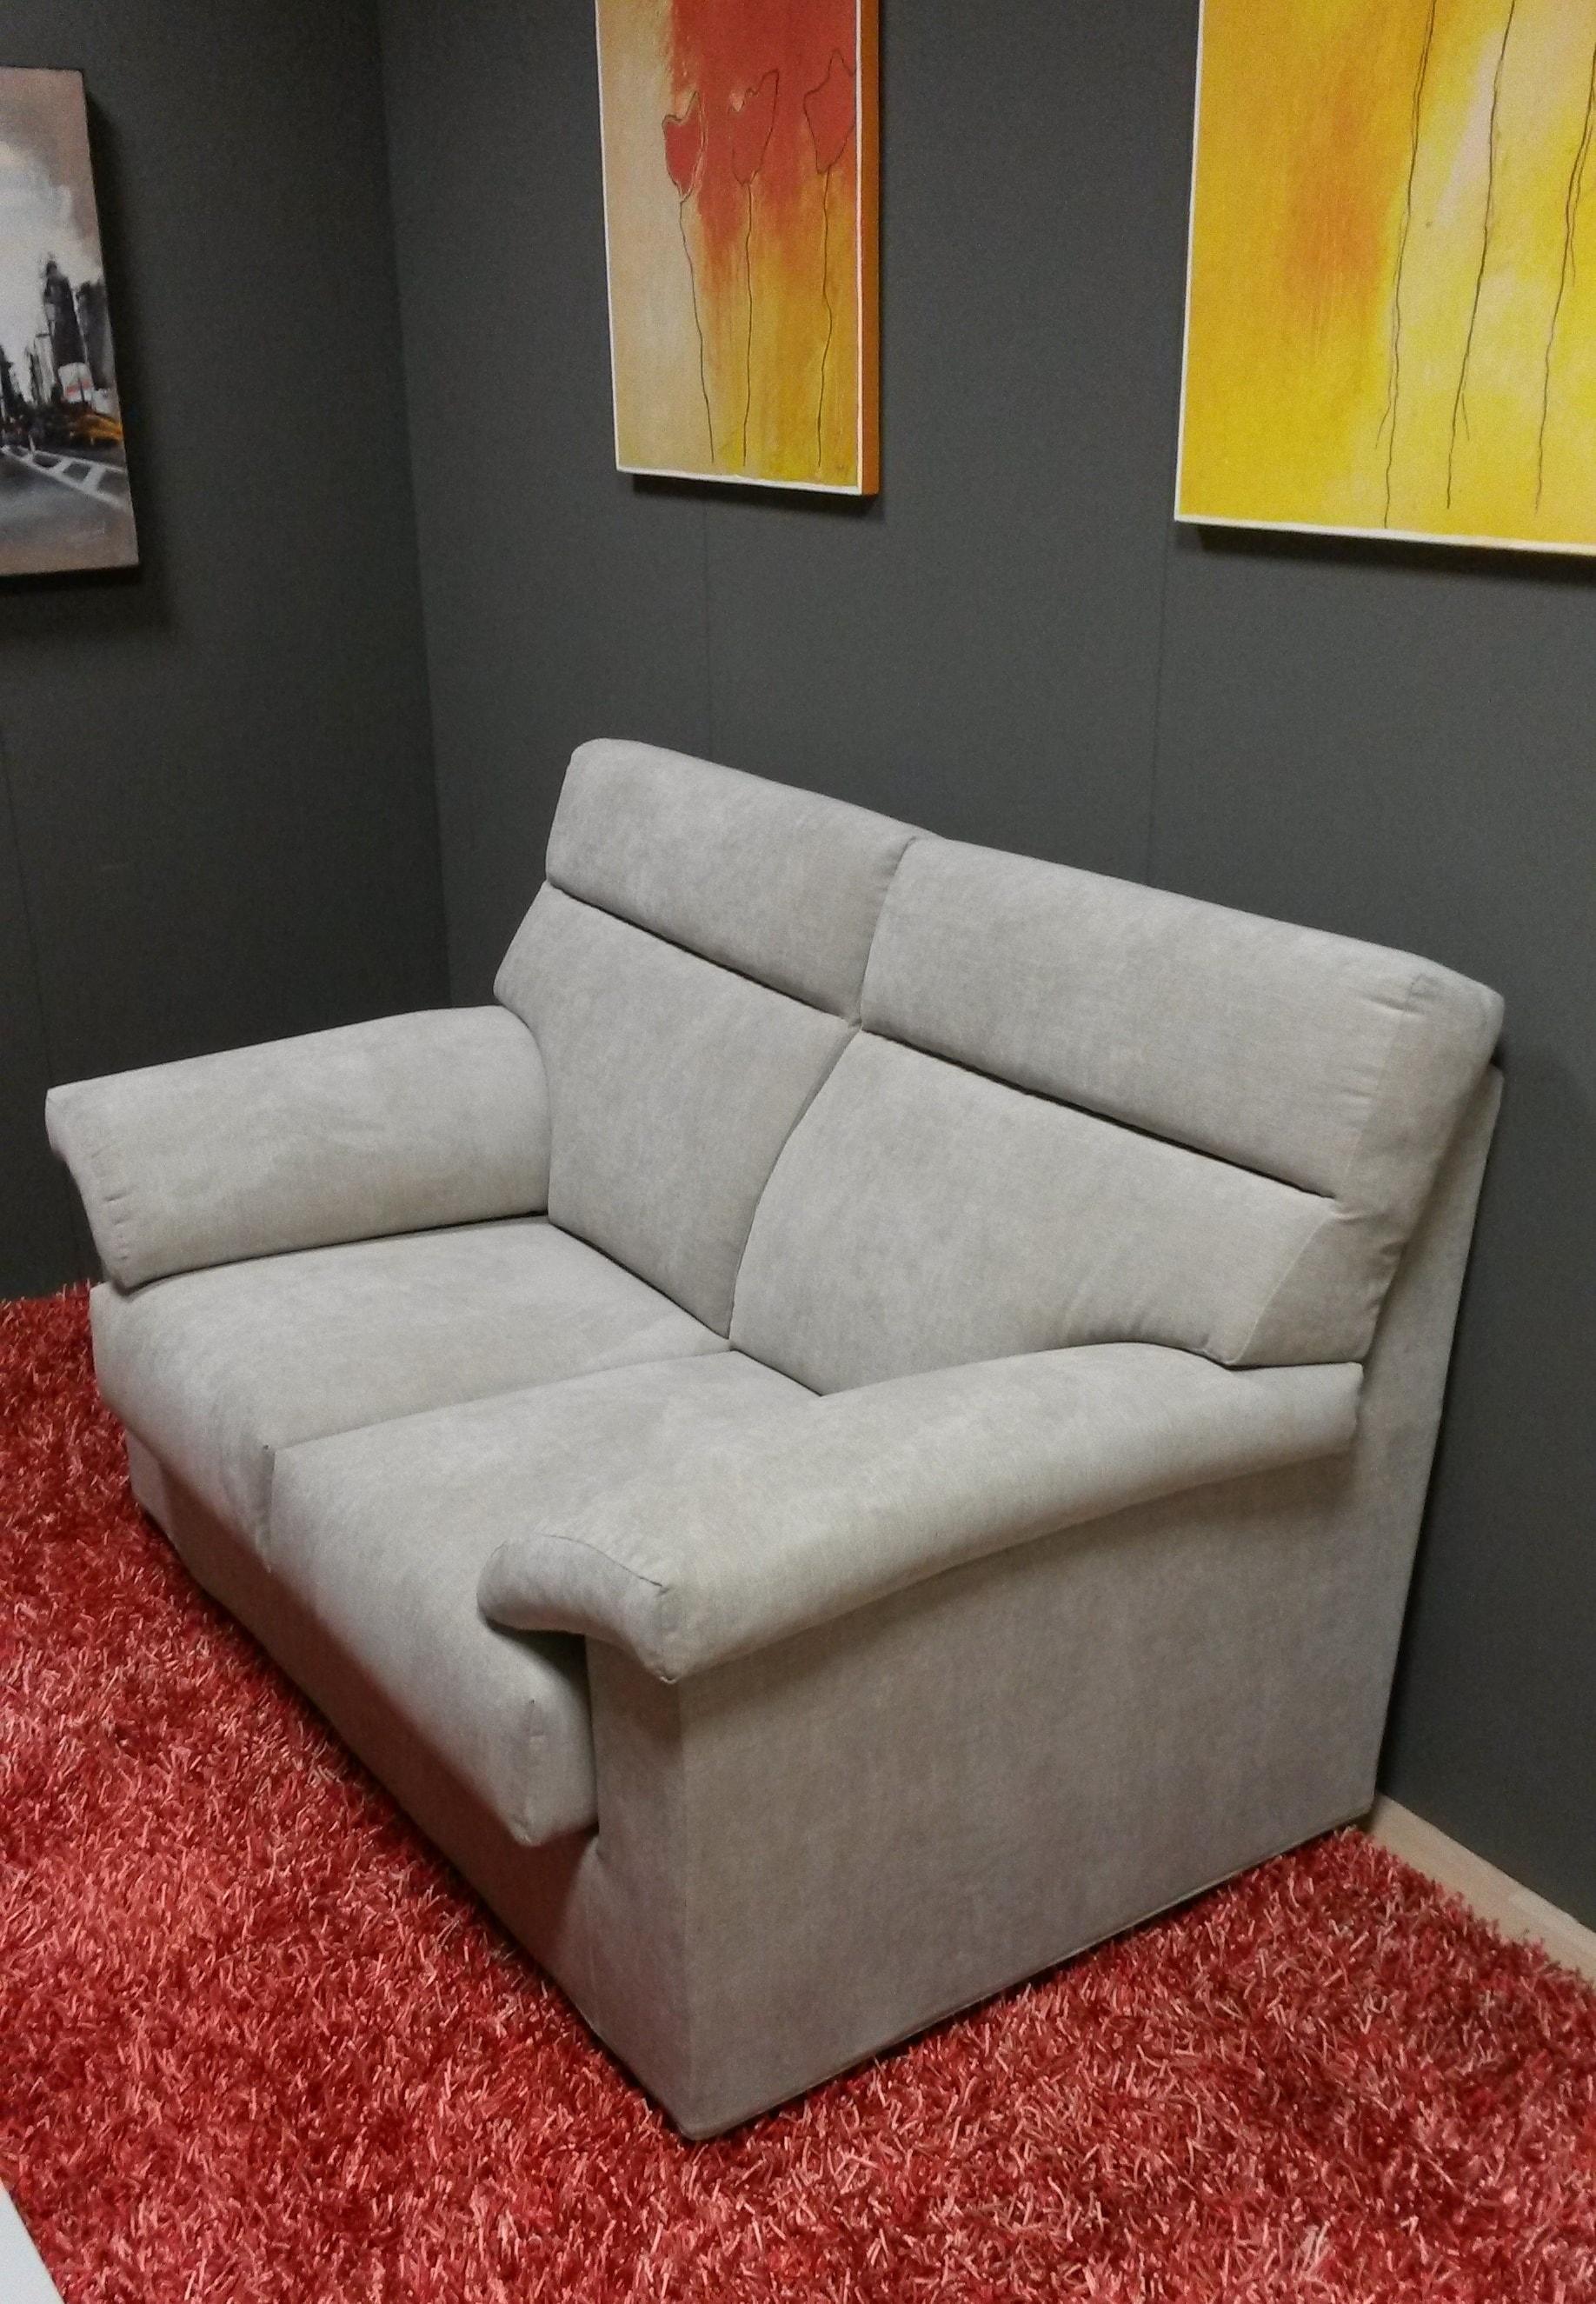 Divano due posti modello jazz divani a prezzi scontati - Amazon divani due posti ...